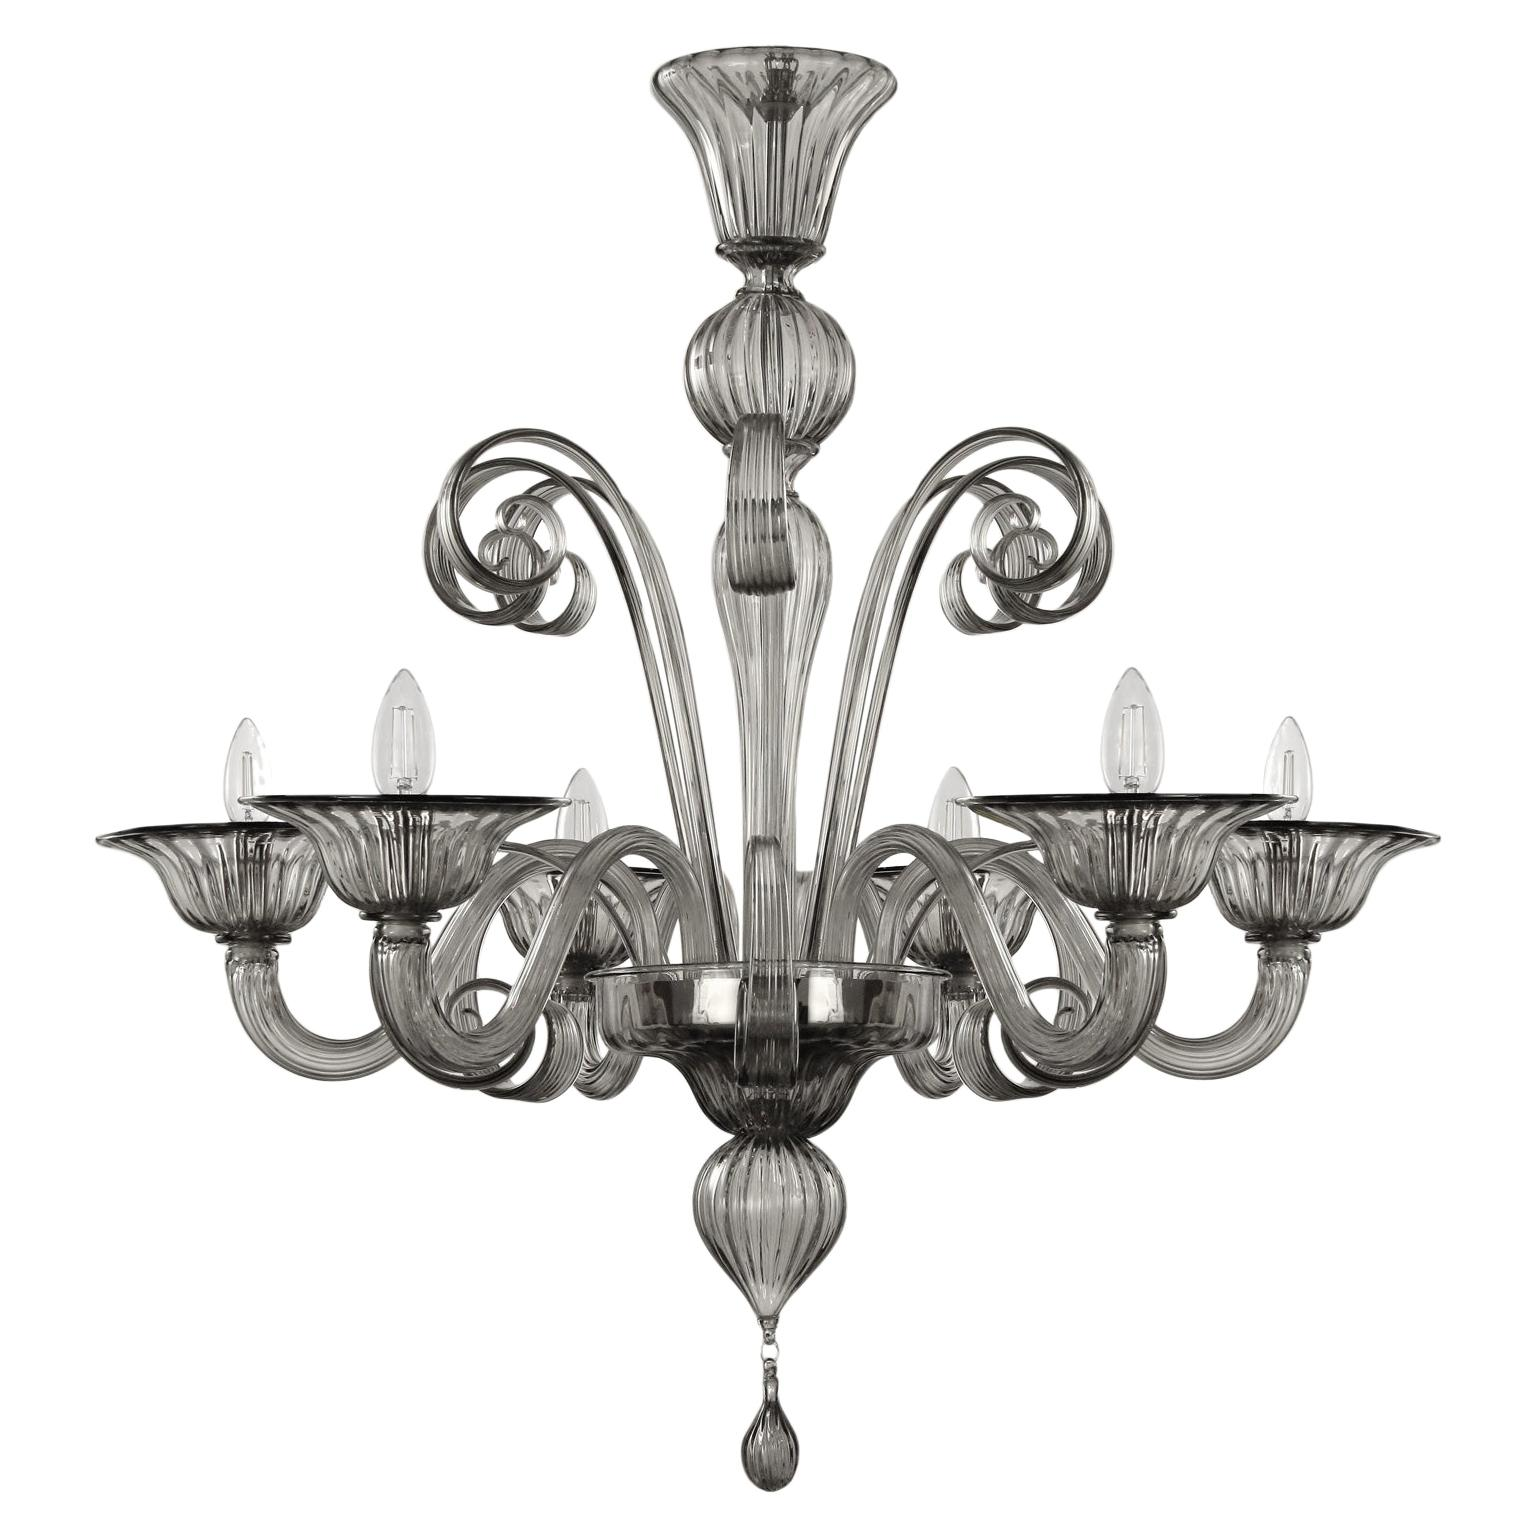 Chandelier 6 arms grey handblown artistic Murano Glass by Multiforme